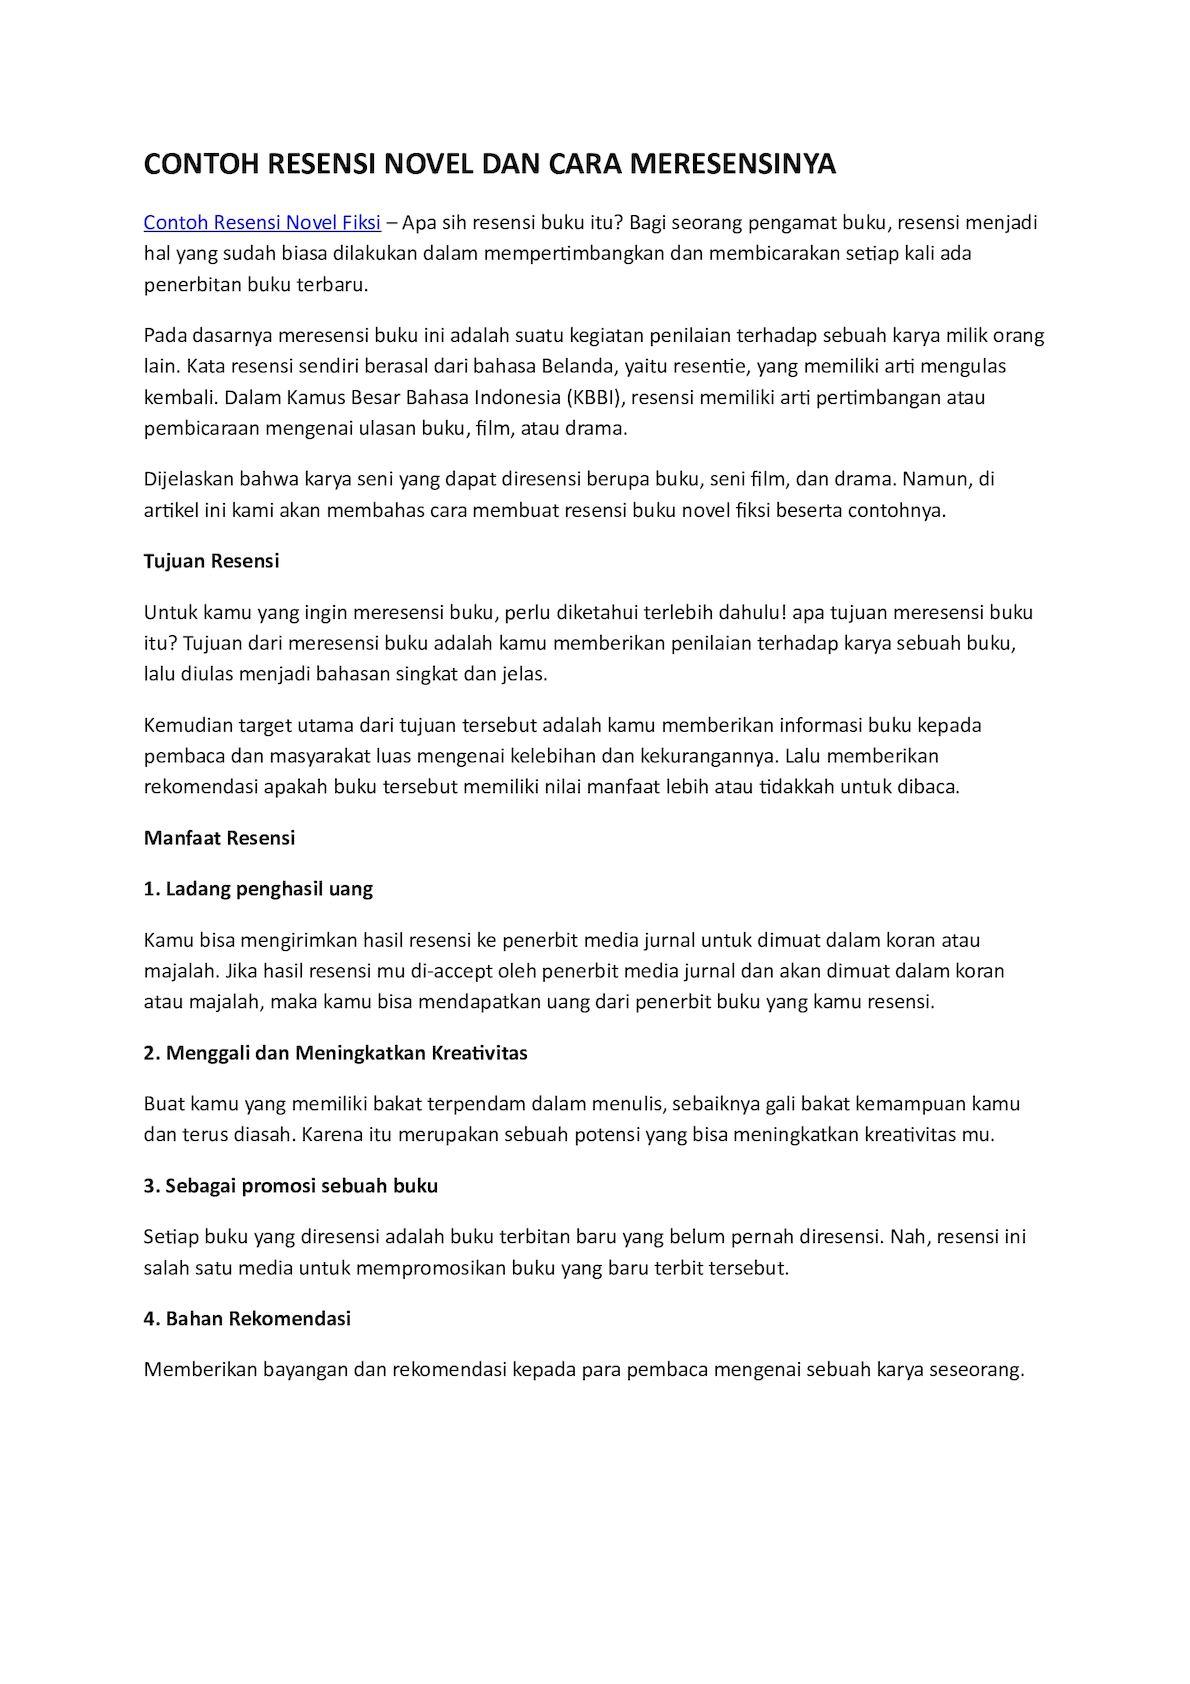 Cara Membuat Sinopsis Novel : membuat, sinopsis, novel, Calaméo, Contoh, Resensi, Novel, Meresensinya